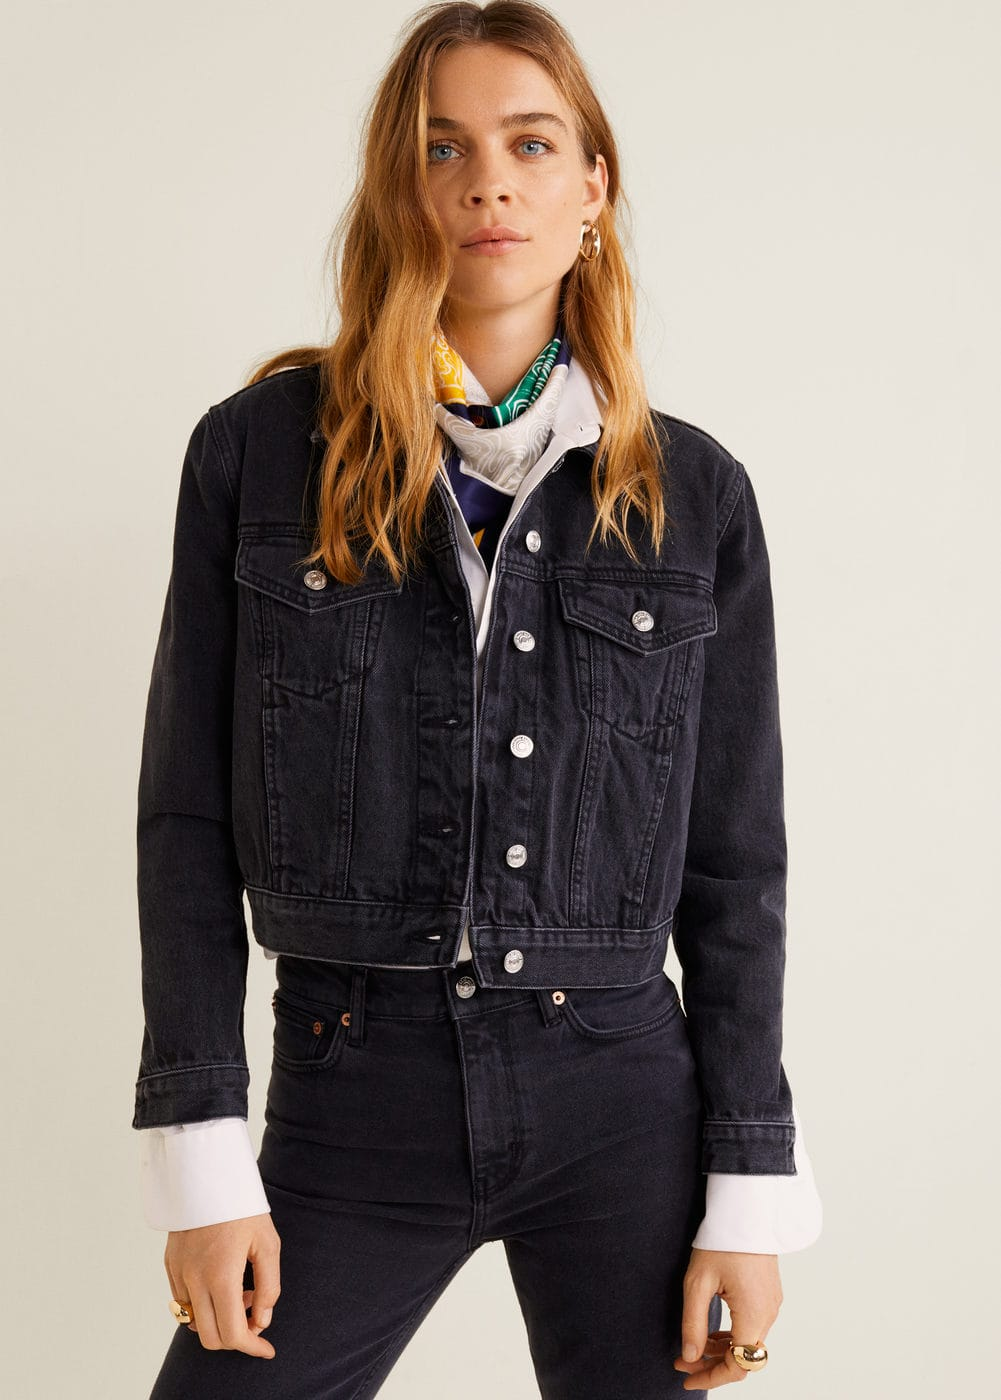 628b0defa7 Pocketed denim jacket - Woman | Mango Netherlands